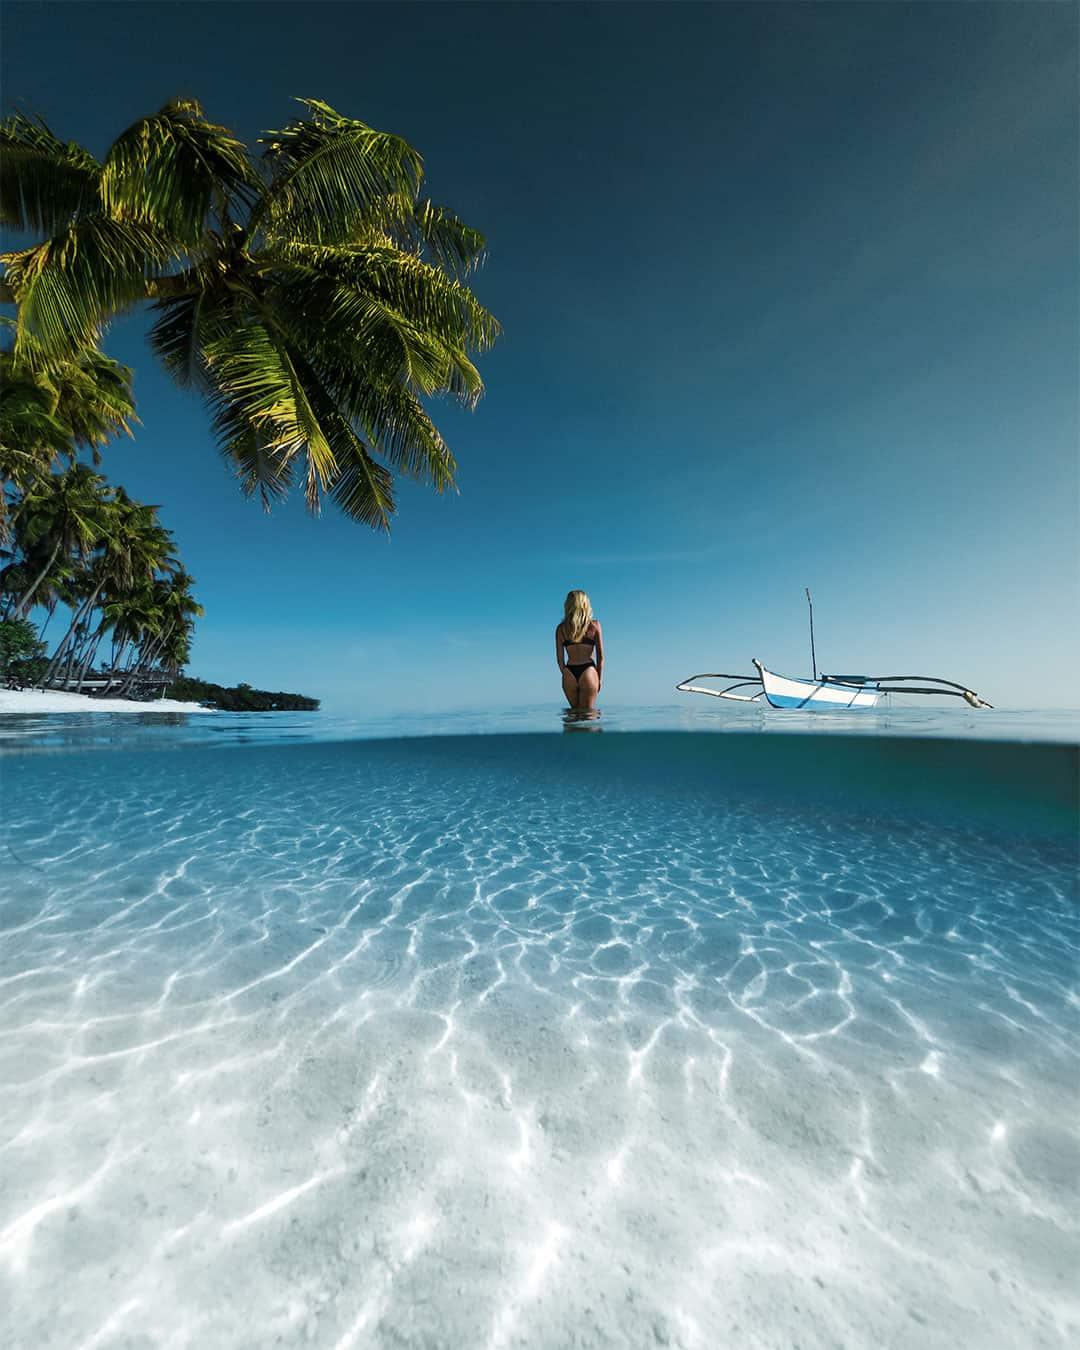 gopro-dome-port-white-sand-beach